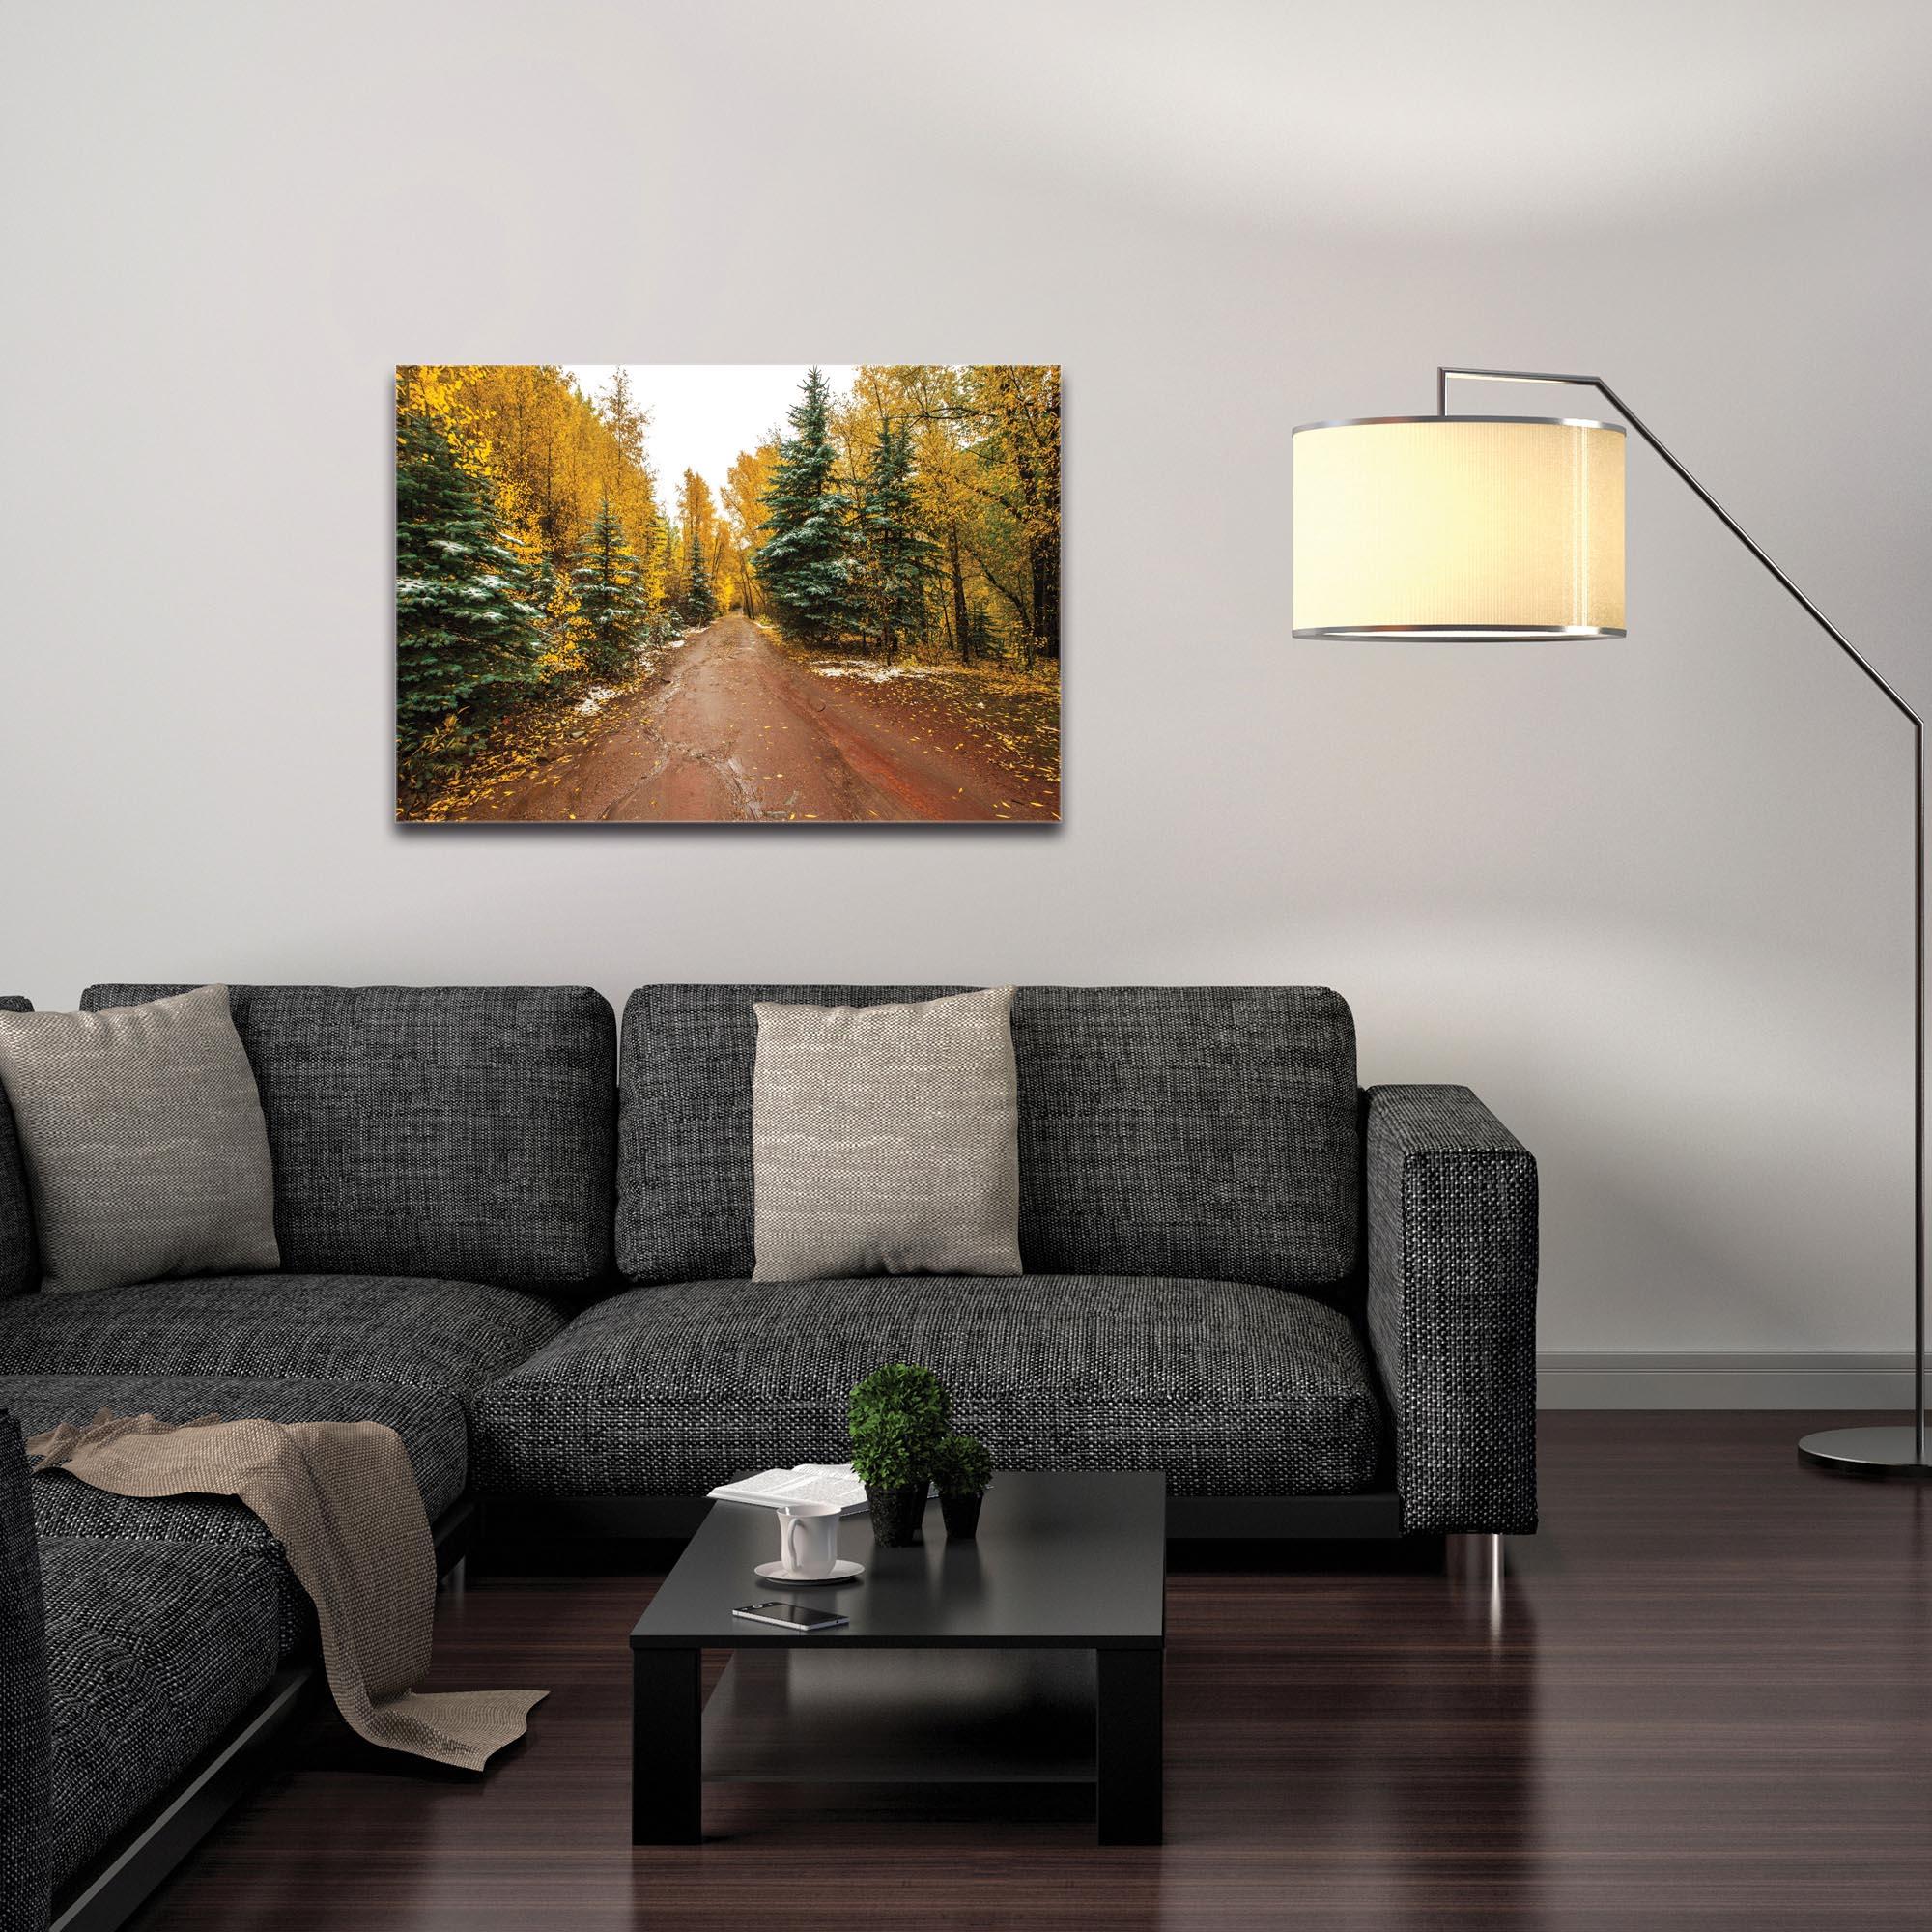 Landscape Photography 'Road Less Traveled' - Autumn Trees Art on Metal or Plexiglass - Image 3